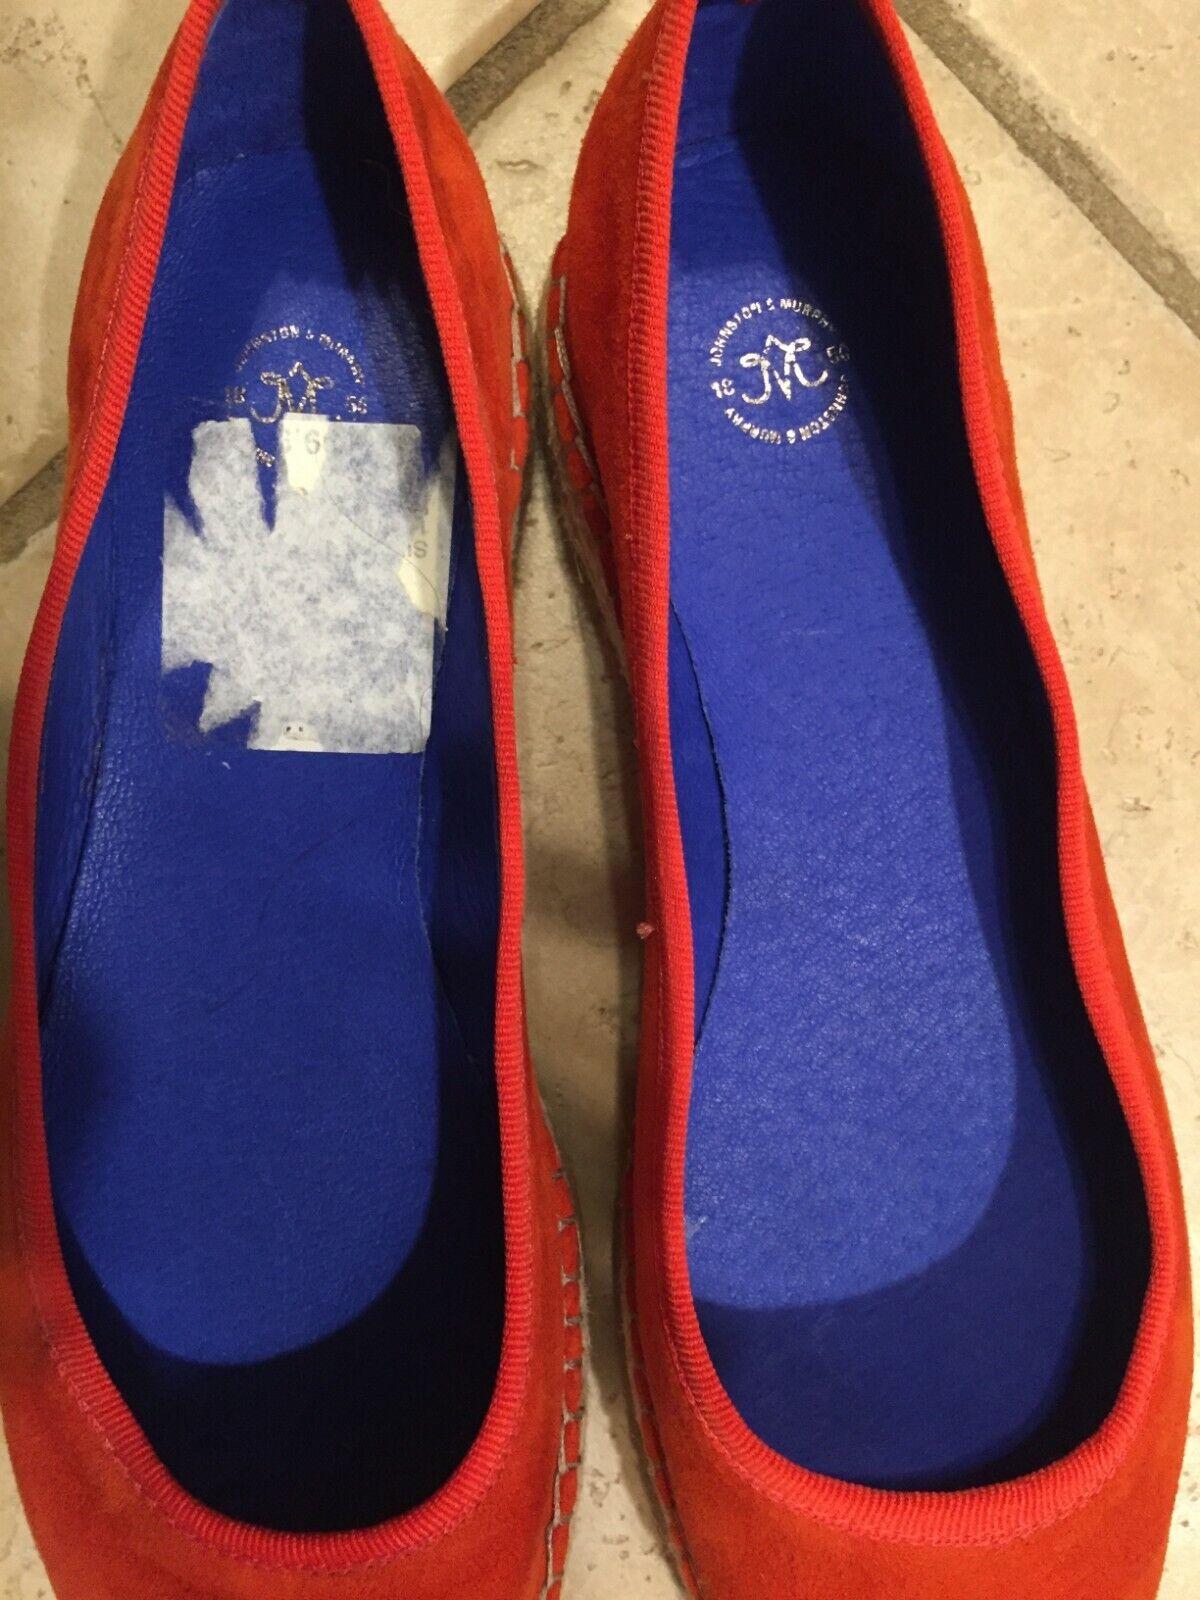 JOHNSTON & MURPHY orange Suede Flats Espadrilles Slip-On Slip-On Slip-On Womens Size 6.5M NWOB cc7122